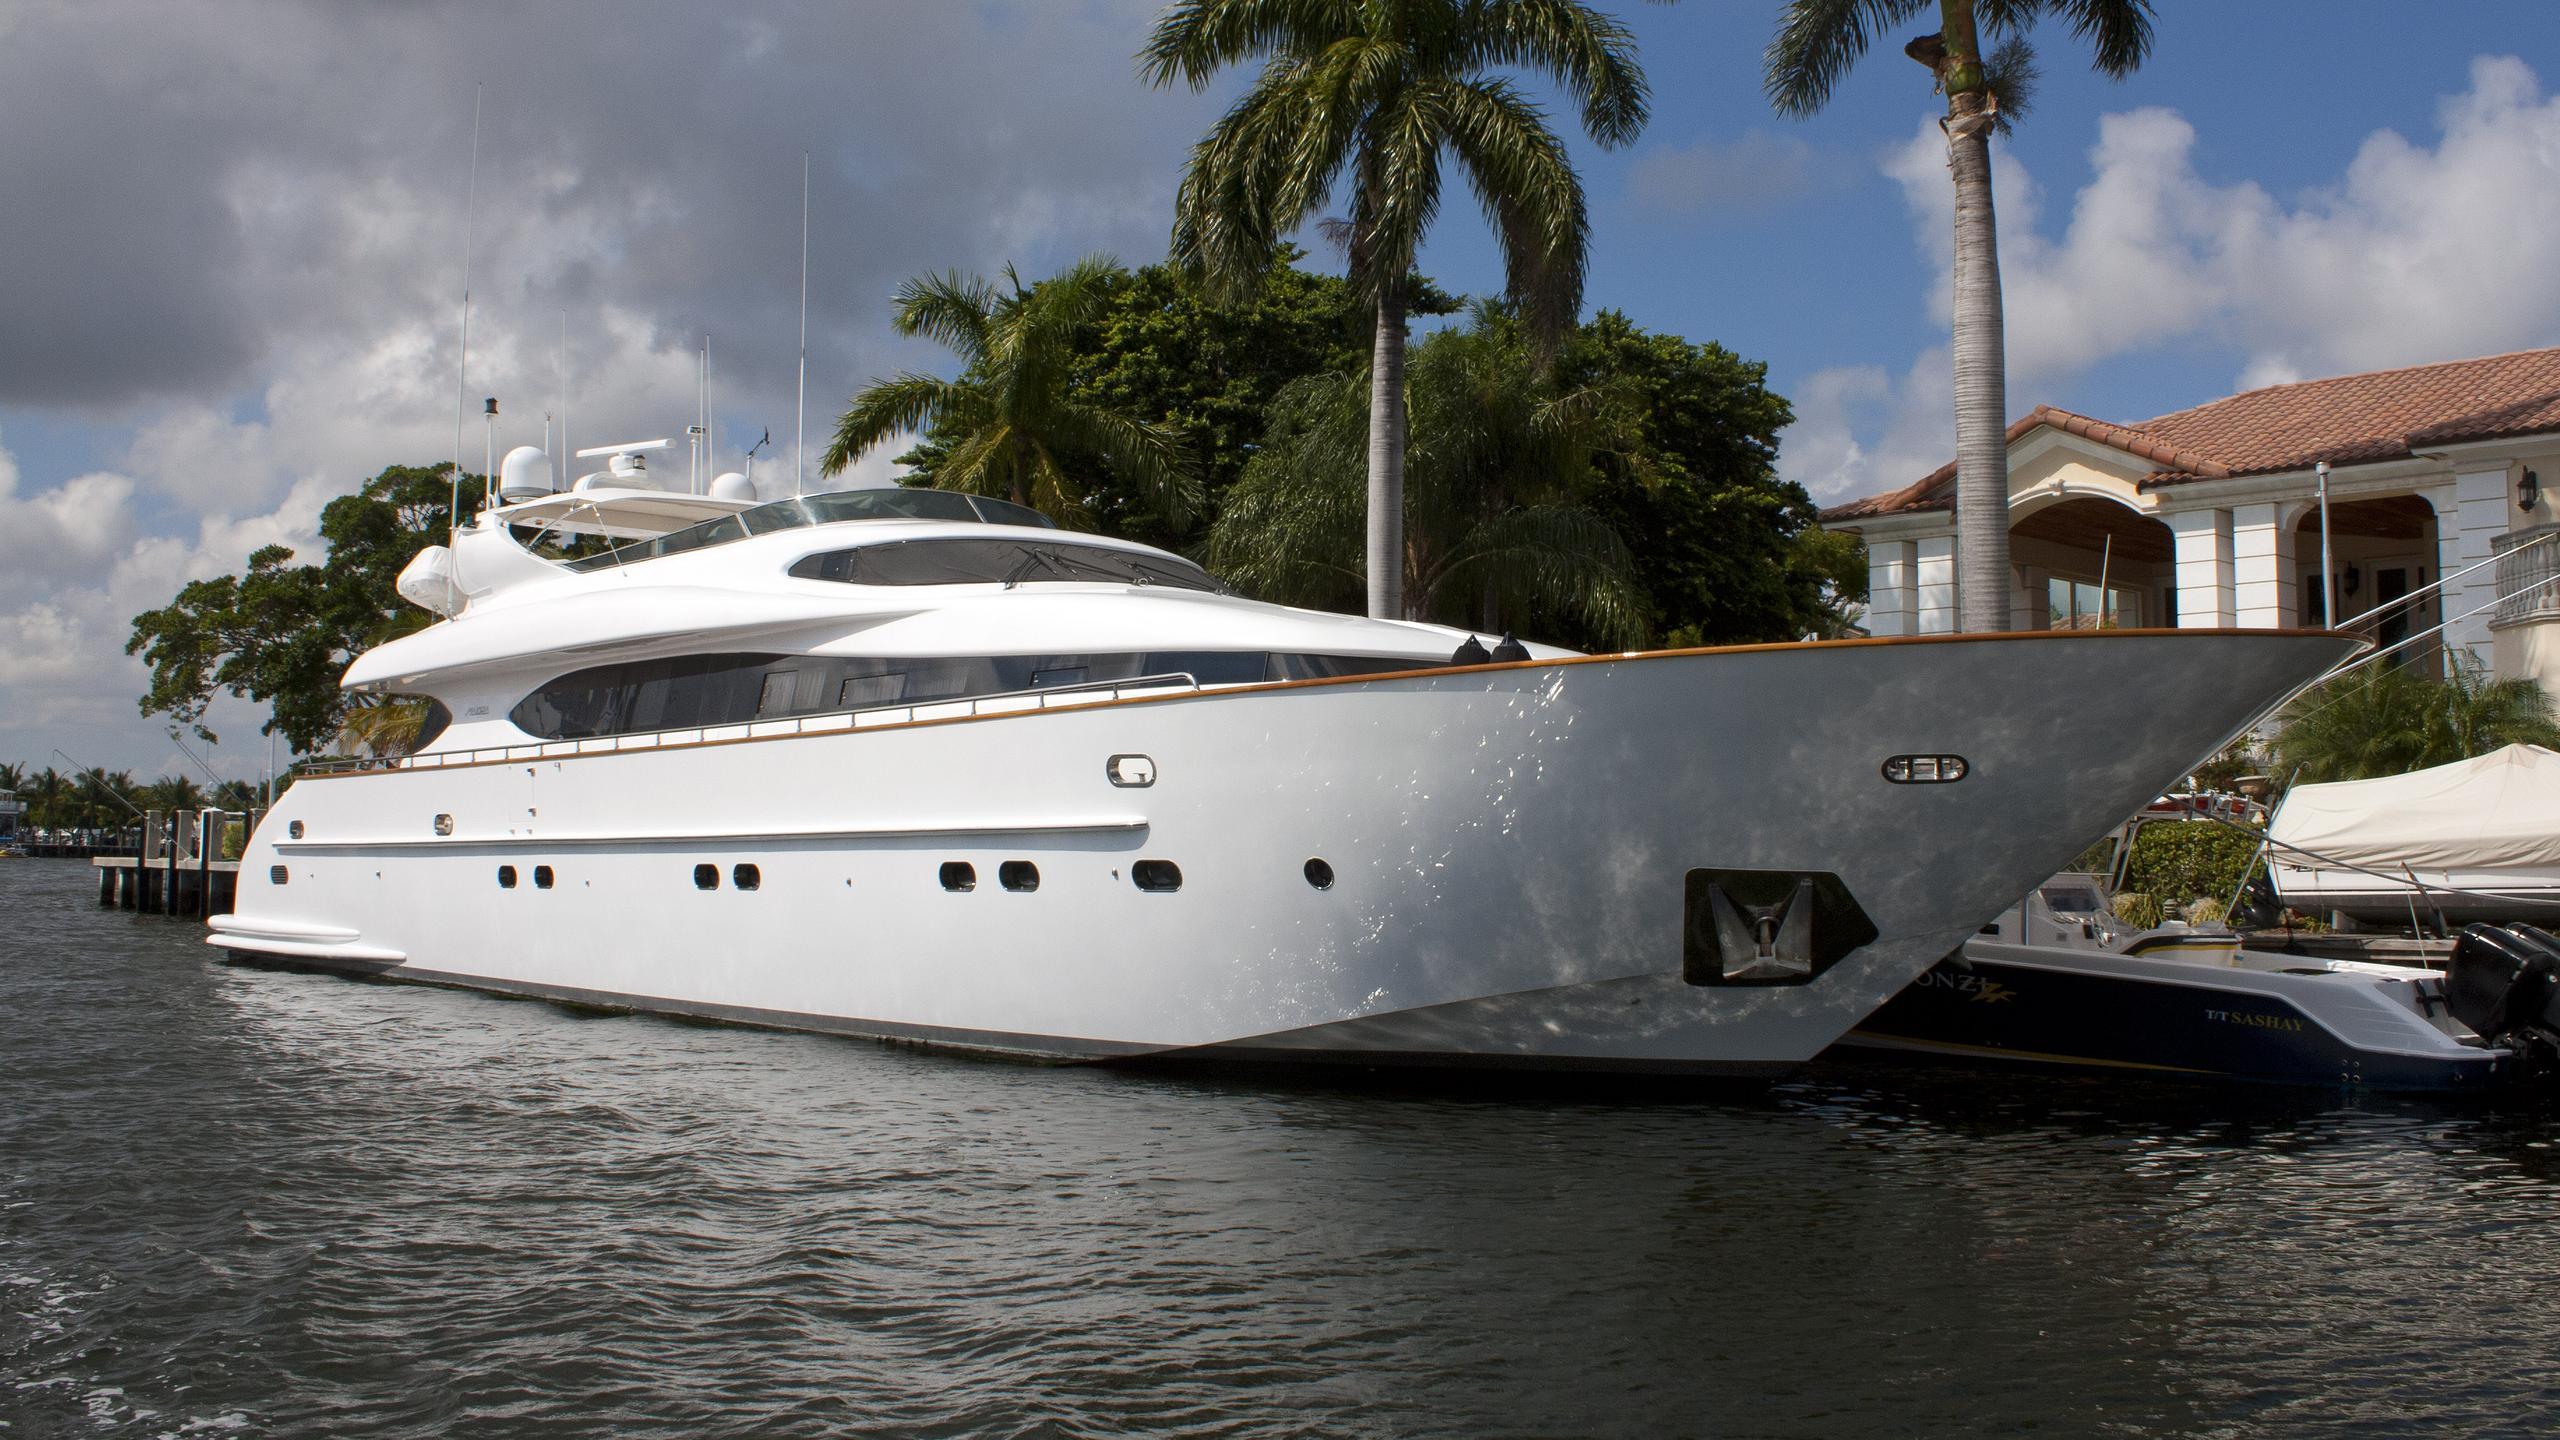 sashay-motor-yacht-maiora-31dp-1998-31m-front-profile